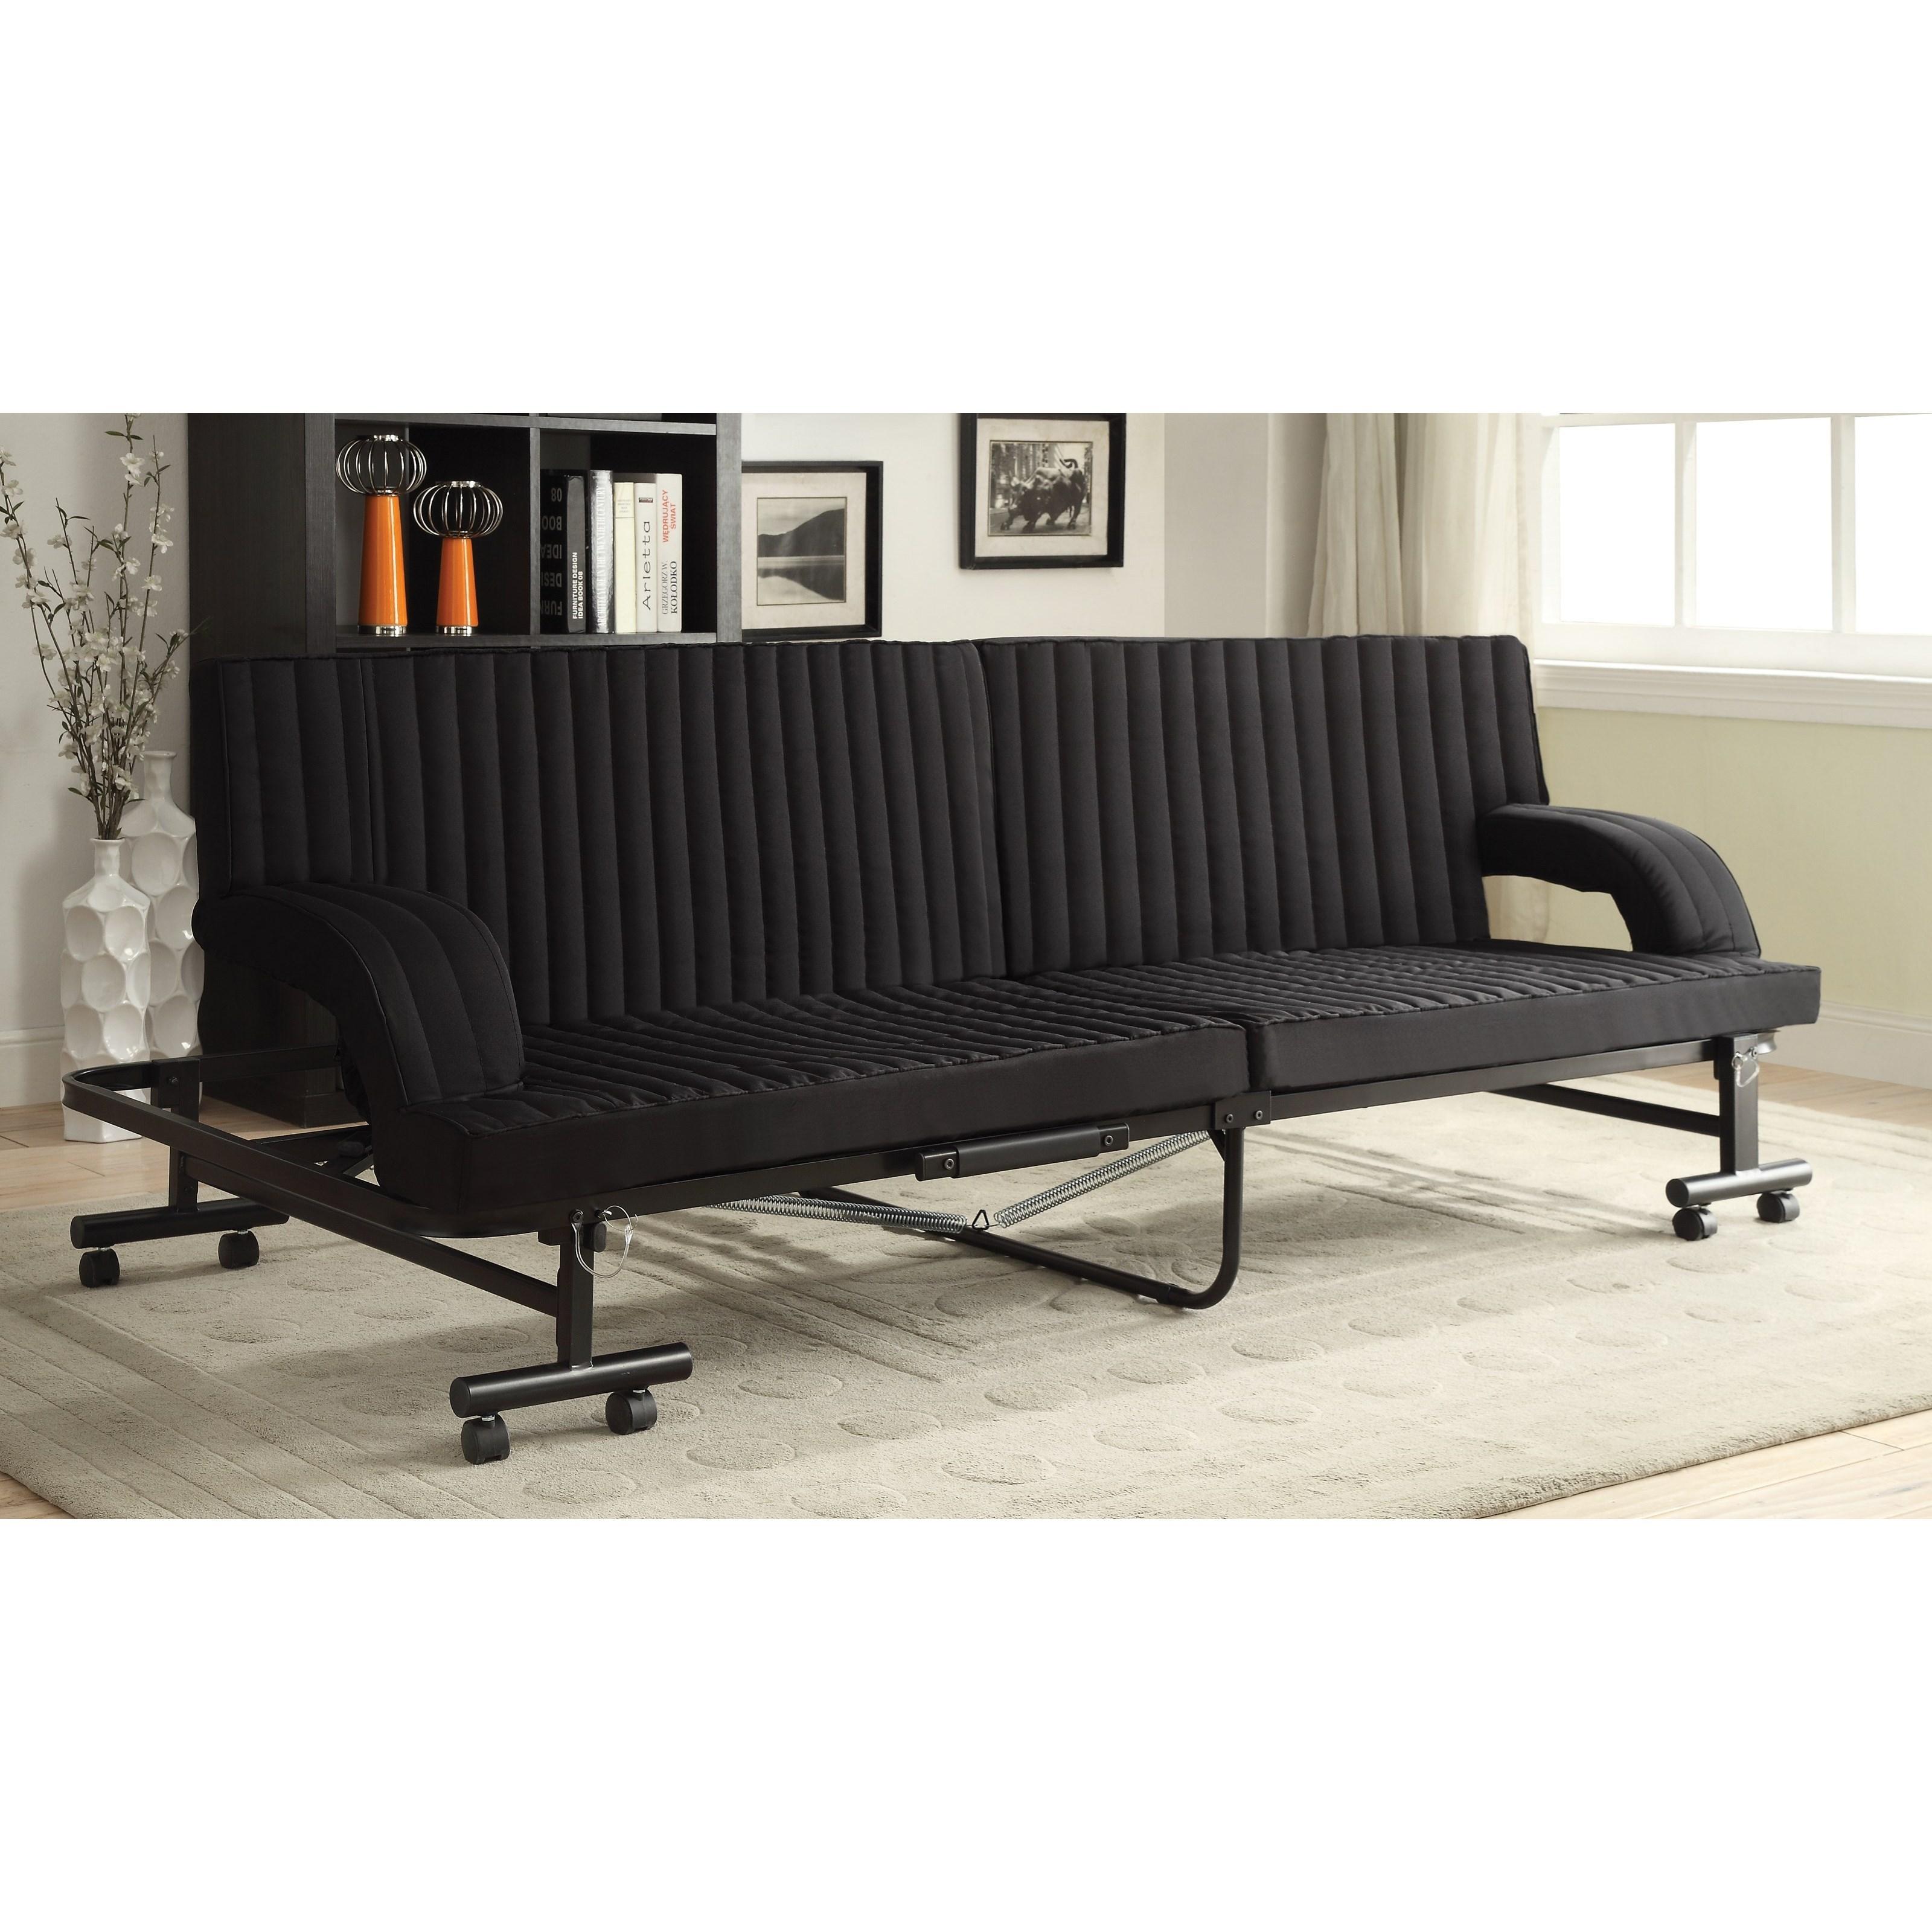 coaster futons 300586 black sofa bed northeast factory. Black Bedroom Furniture Sets. Home Design Ideas